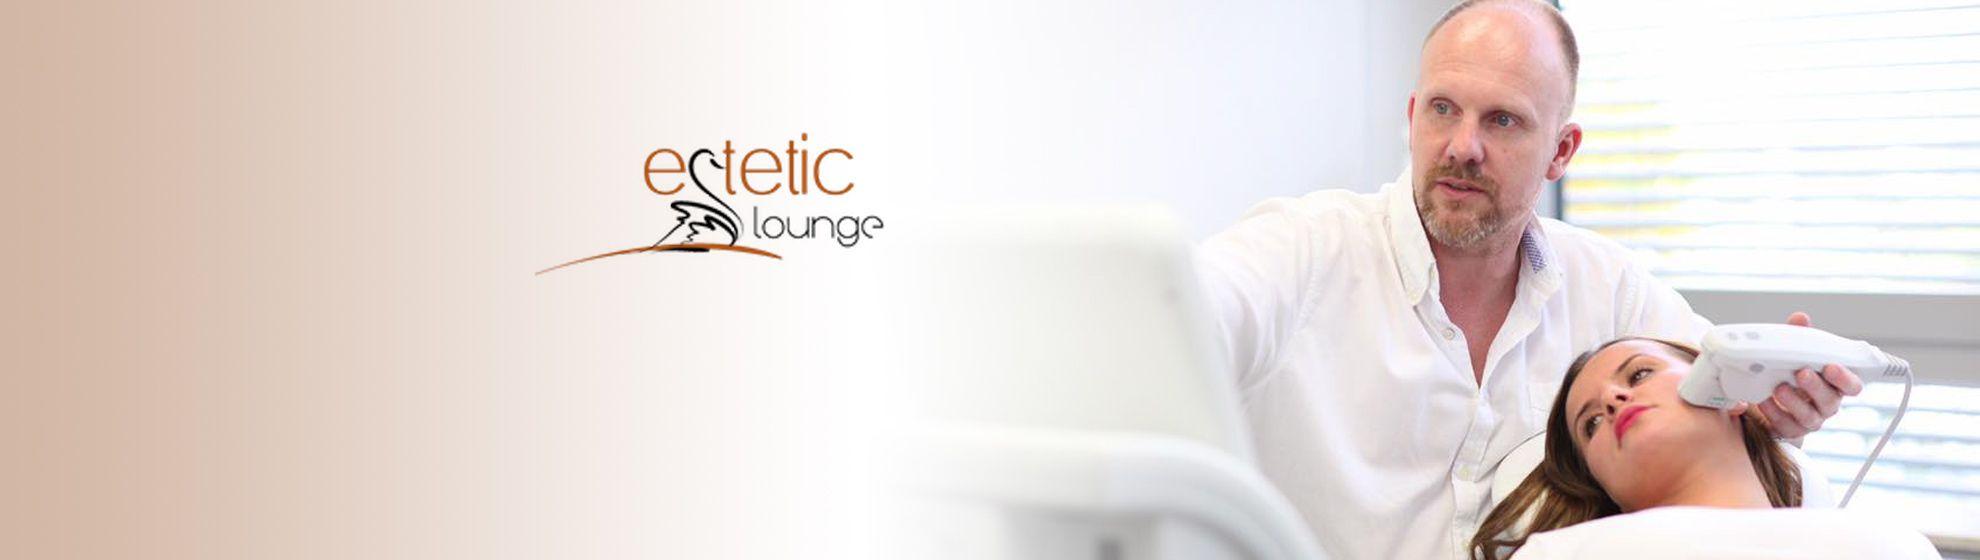 Estetic Lounge - Privatpraxis Steffen Giesse